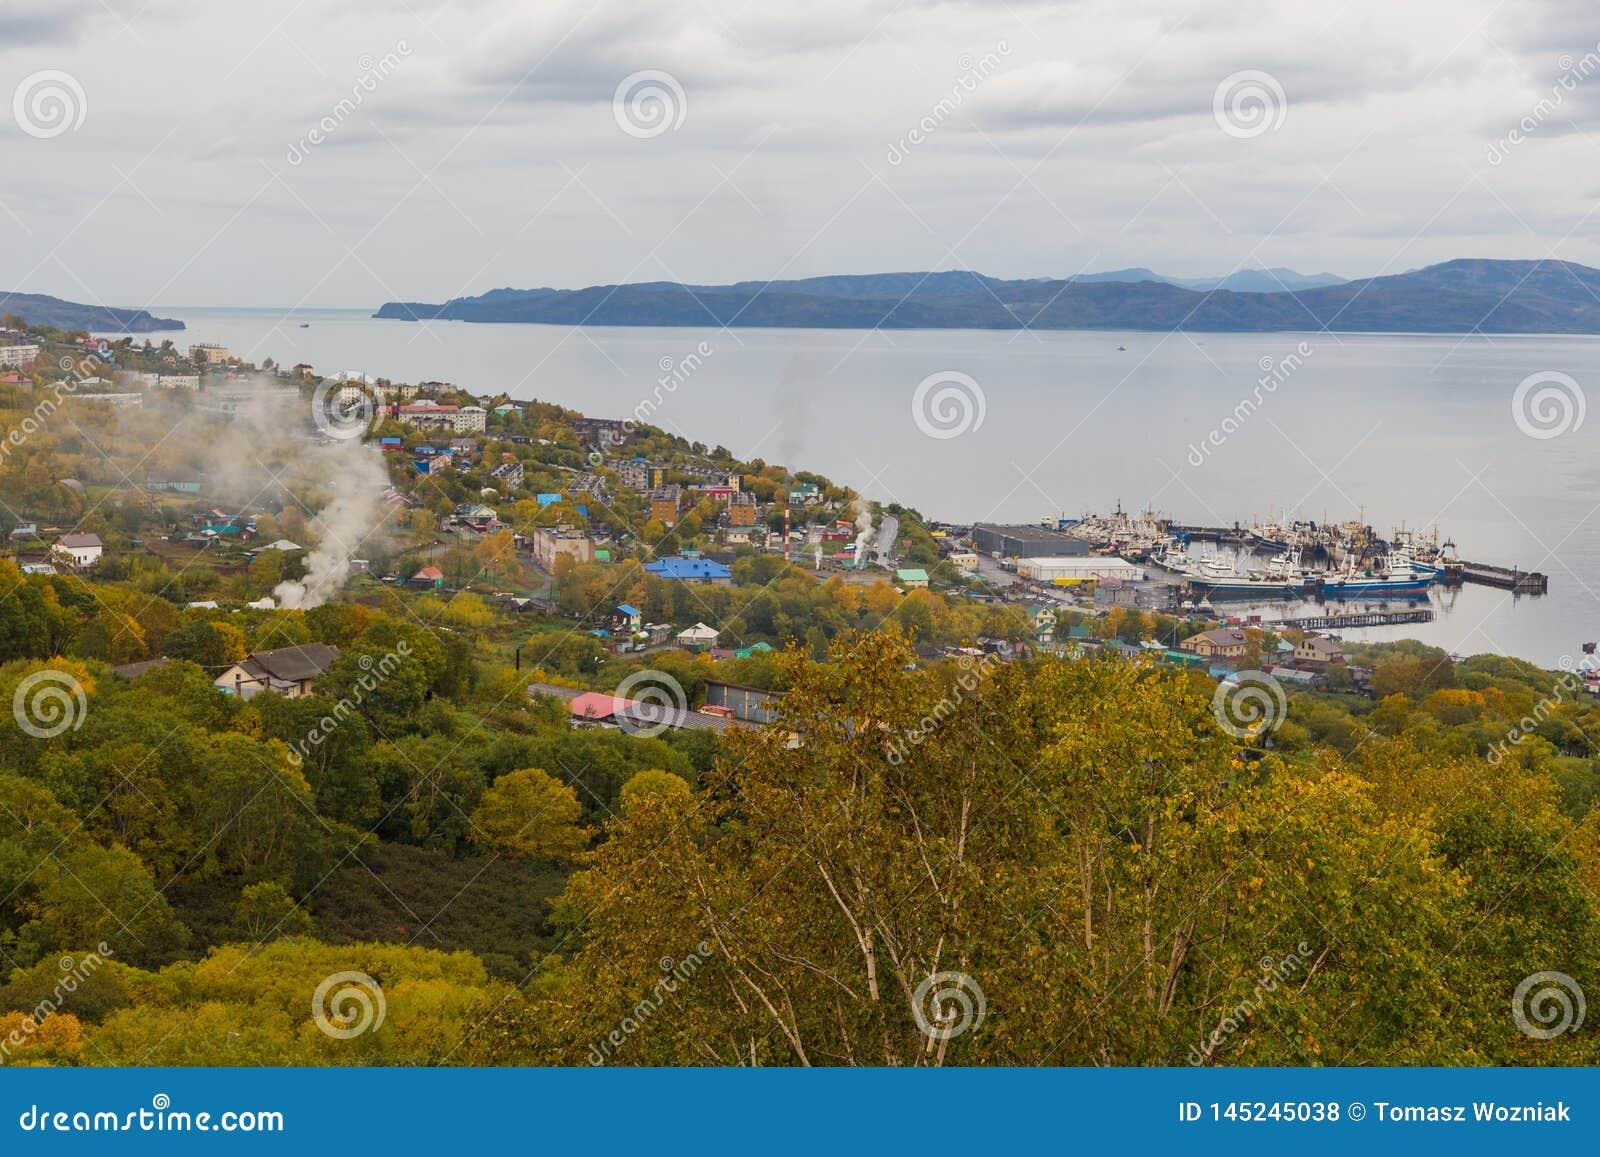 View of port Petropavlovsk-Kamchatsky, Avachinskaya Bay, Russia.